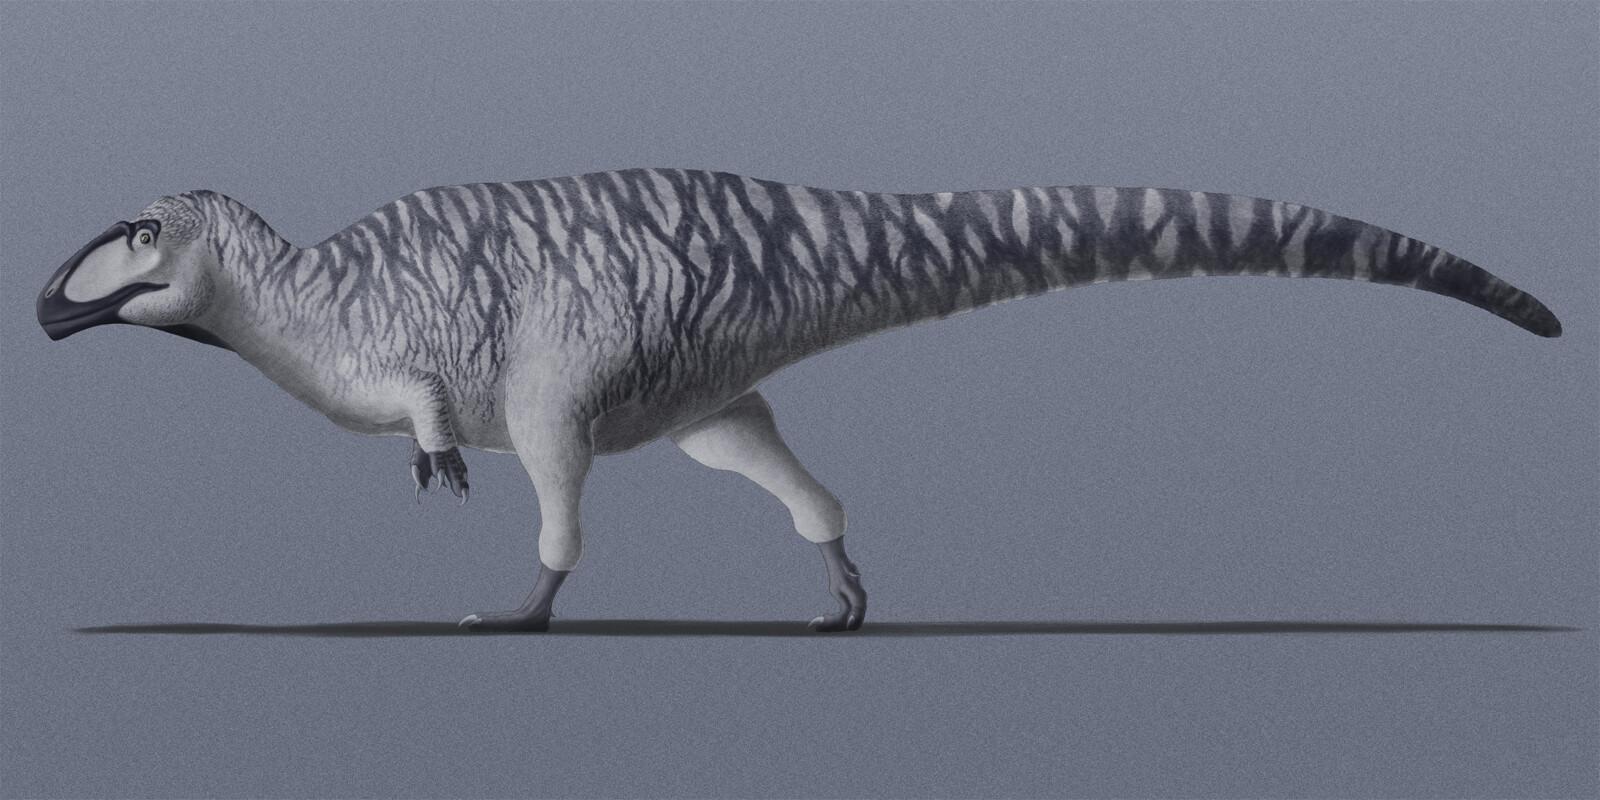 caio-negri-shaochilong-maortuensis-final-2.jpg